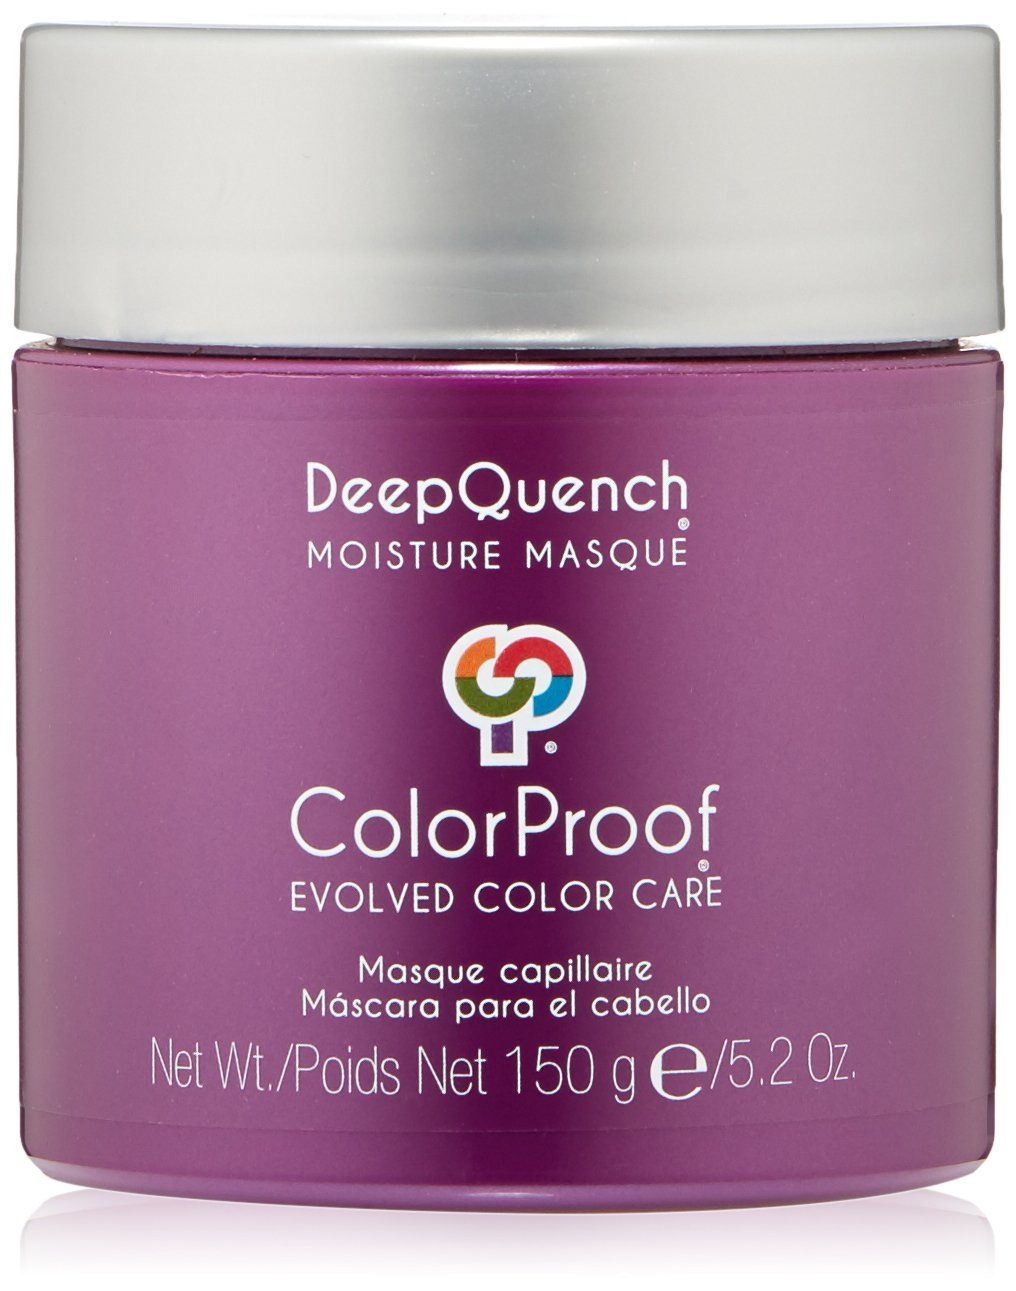 ColorProof Deep Quench Moisture Masque, 5.2 Oz